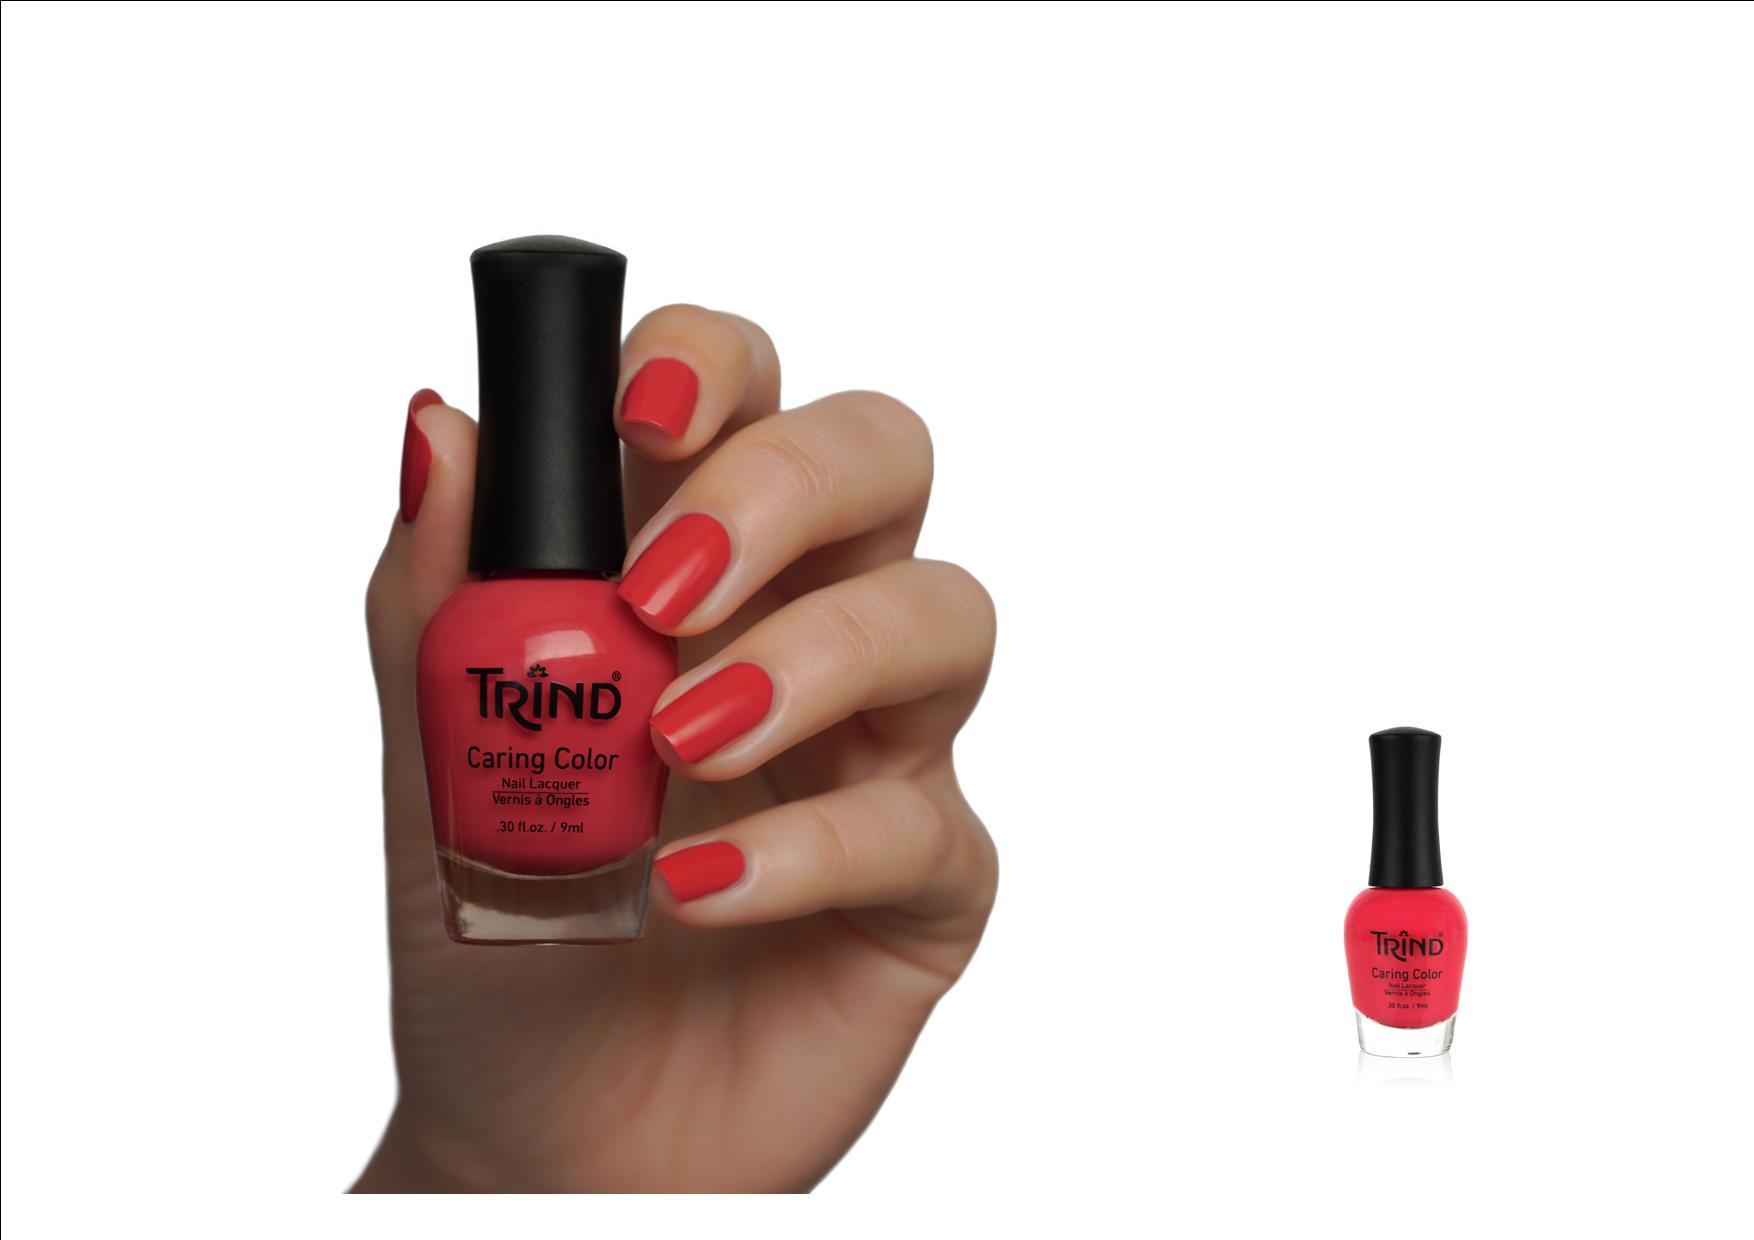 Trind Caring Color Nagellak Hydrangea 301 nieuwe voorjaar/zomer kleur 2020